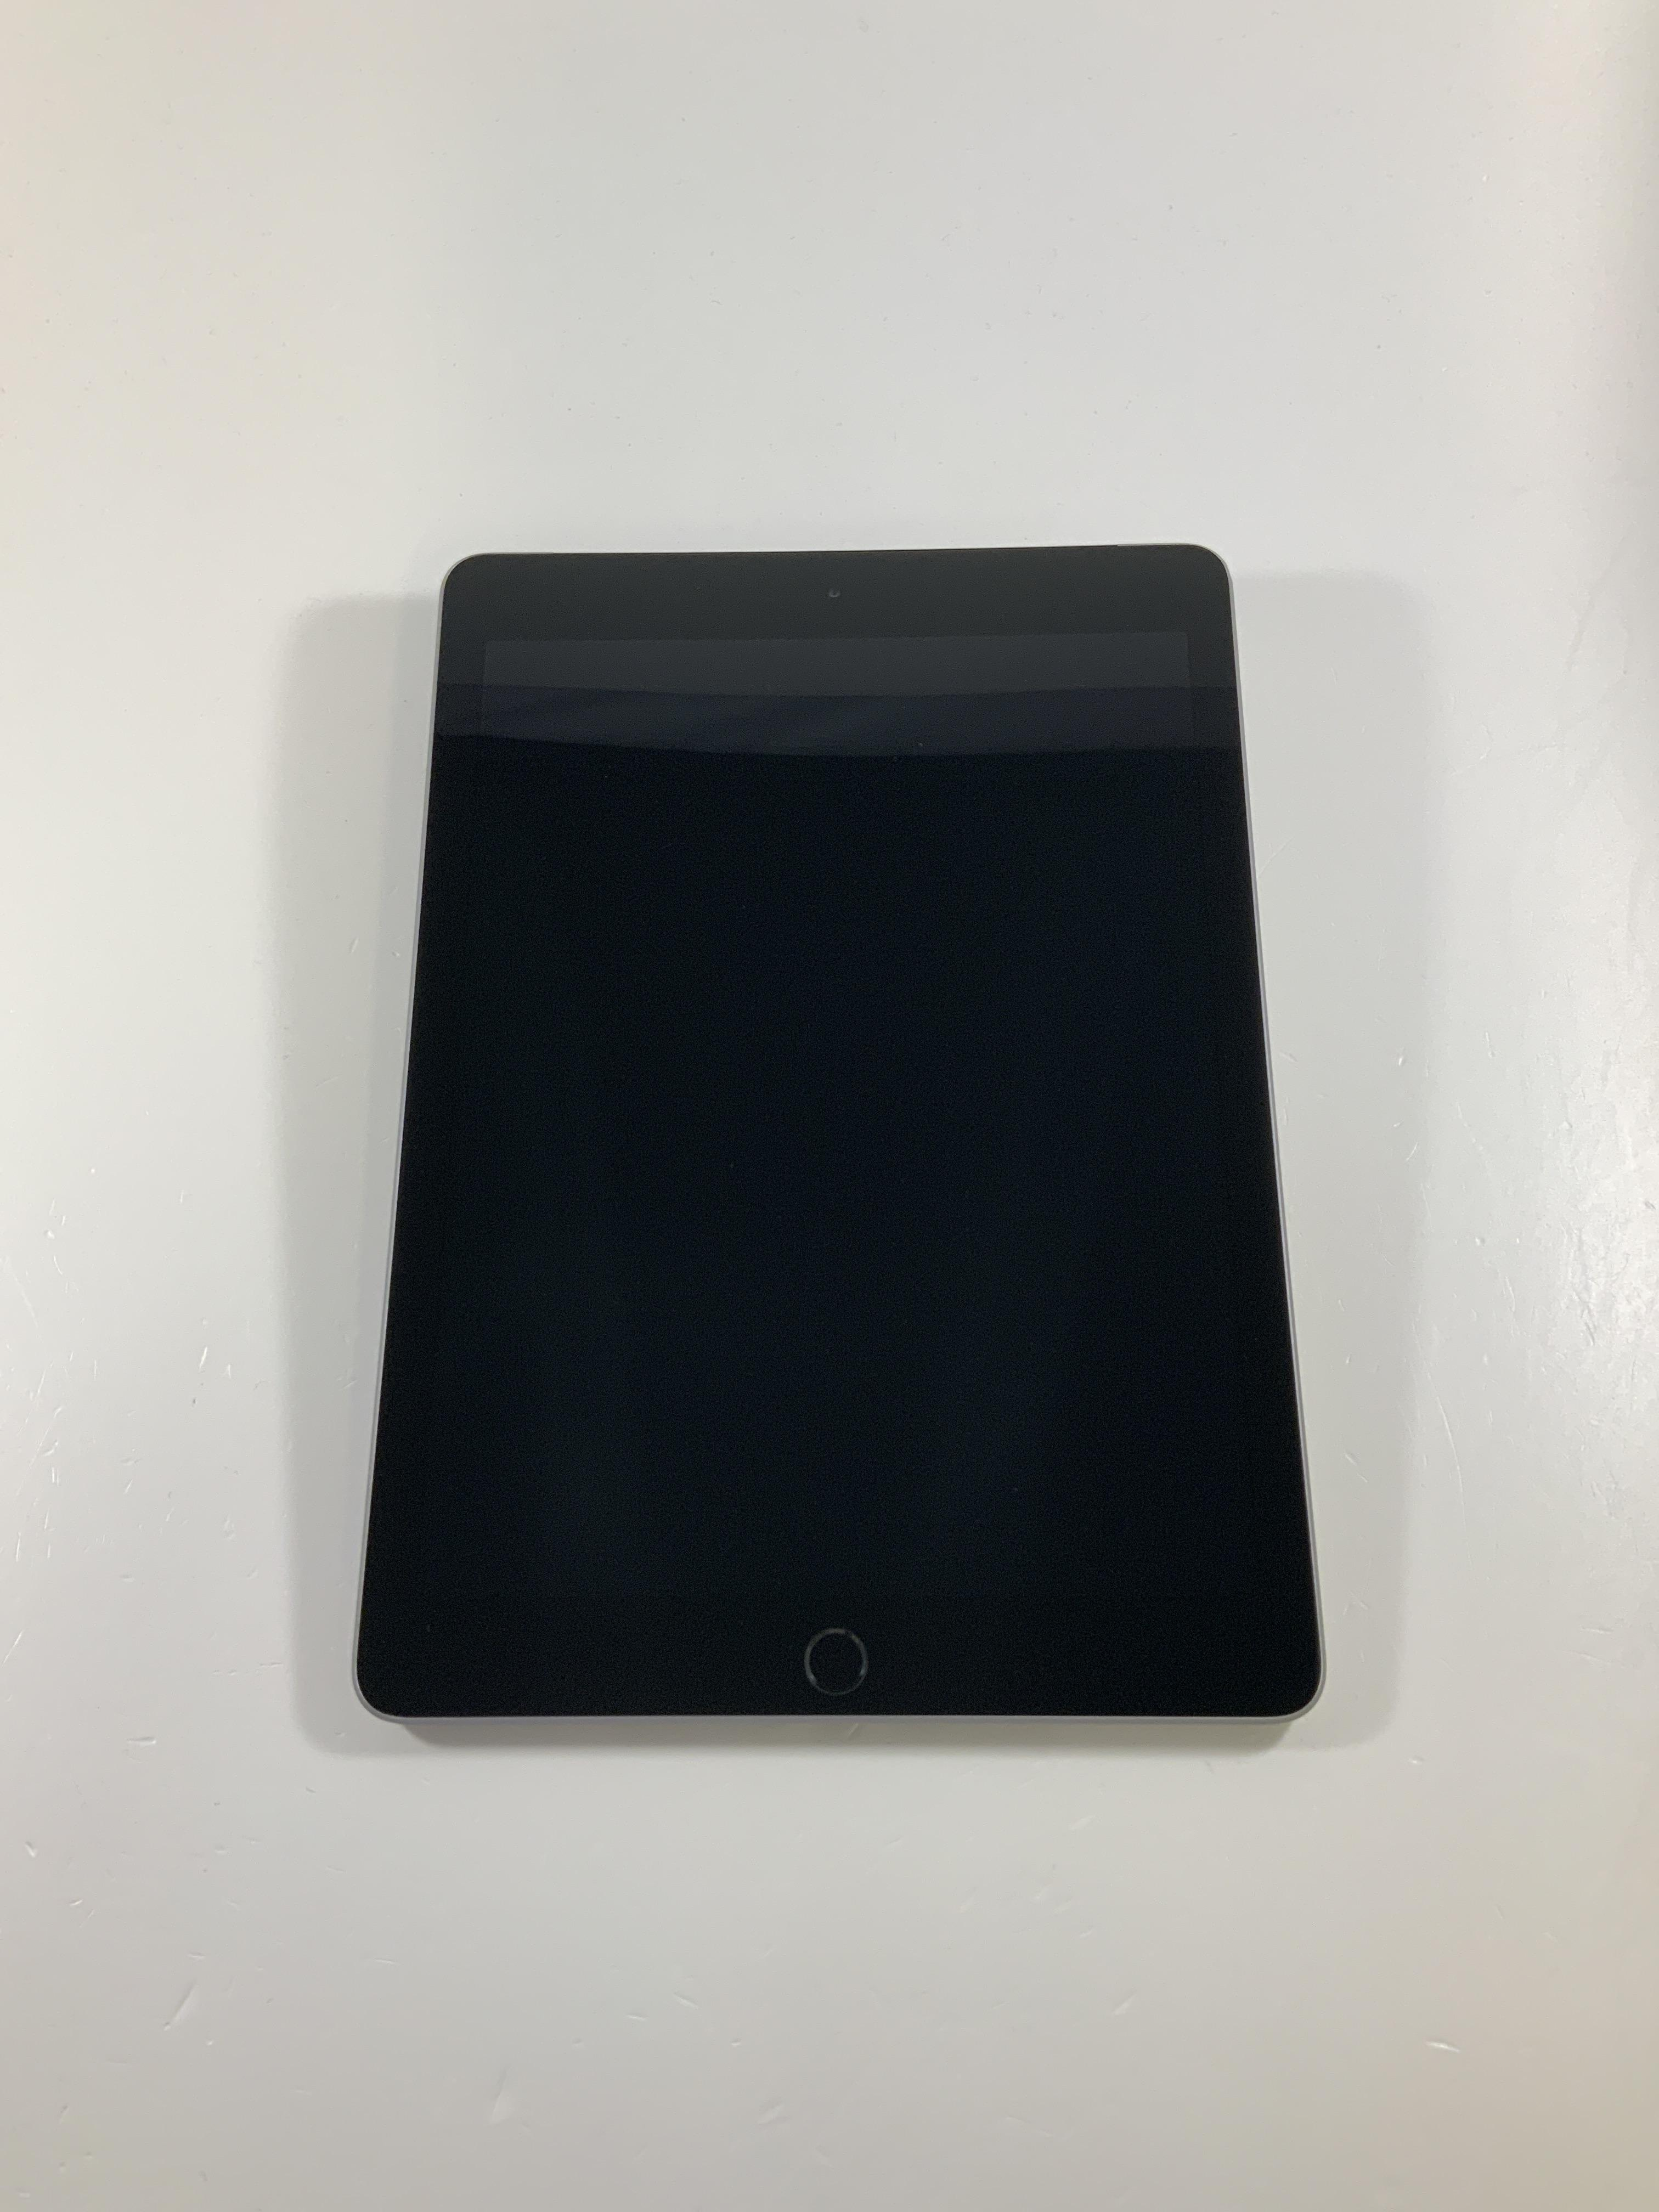 iPad 6 Wi-Fi + Cellular 32GB, 32GB, Space Gray, obraz 1